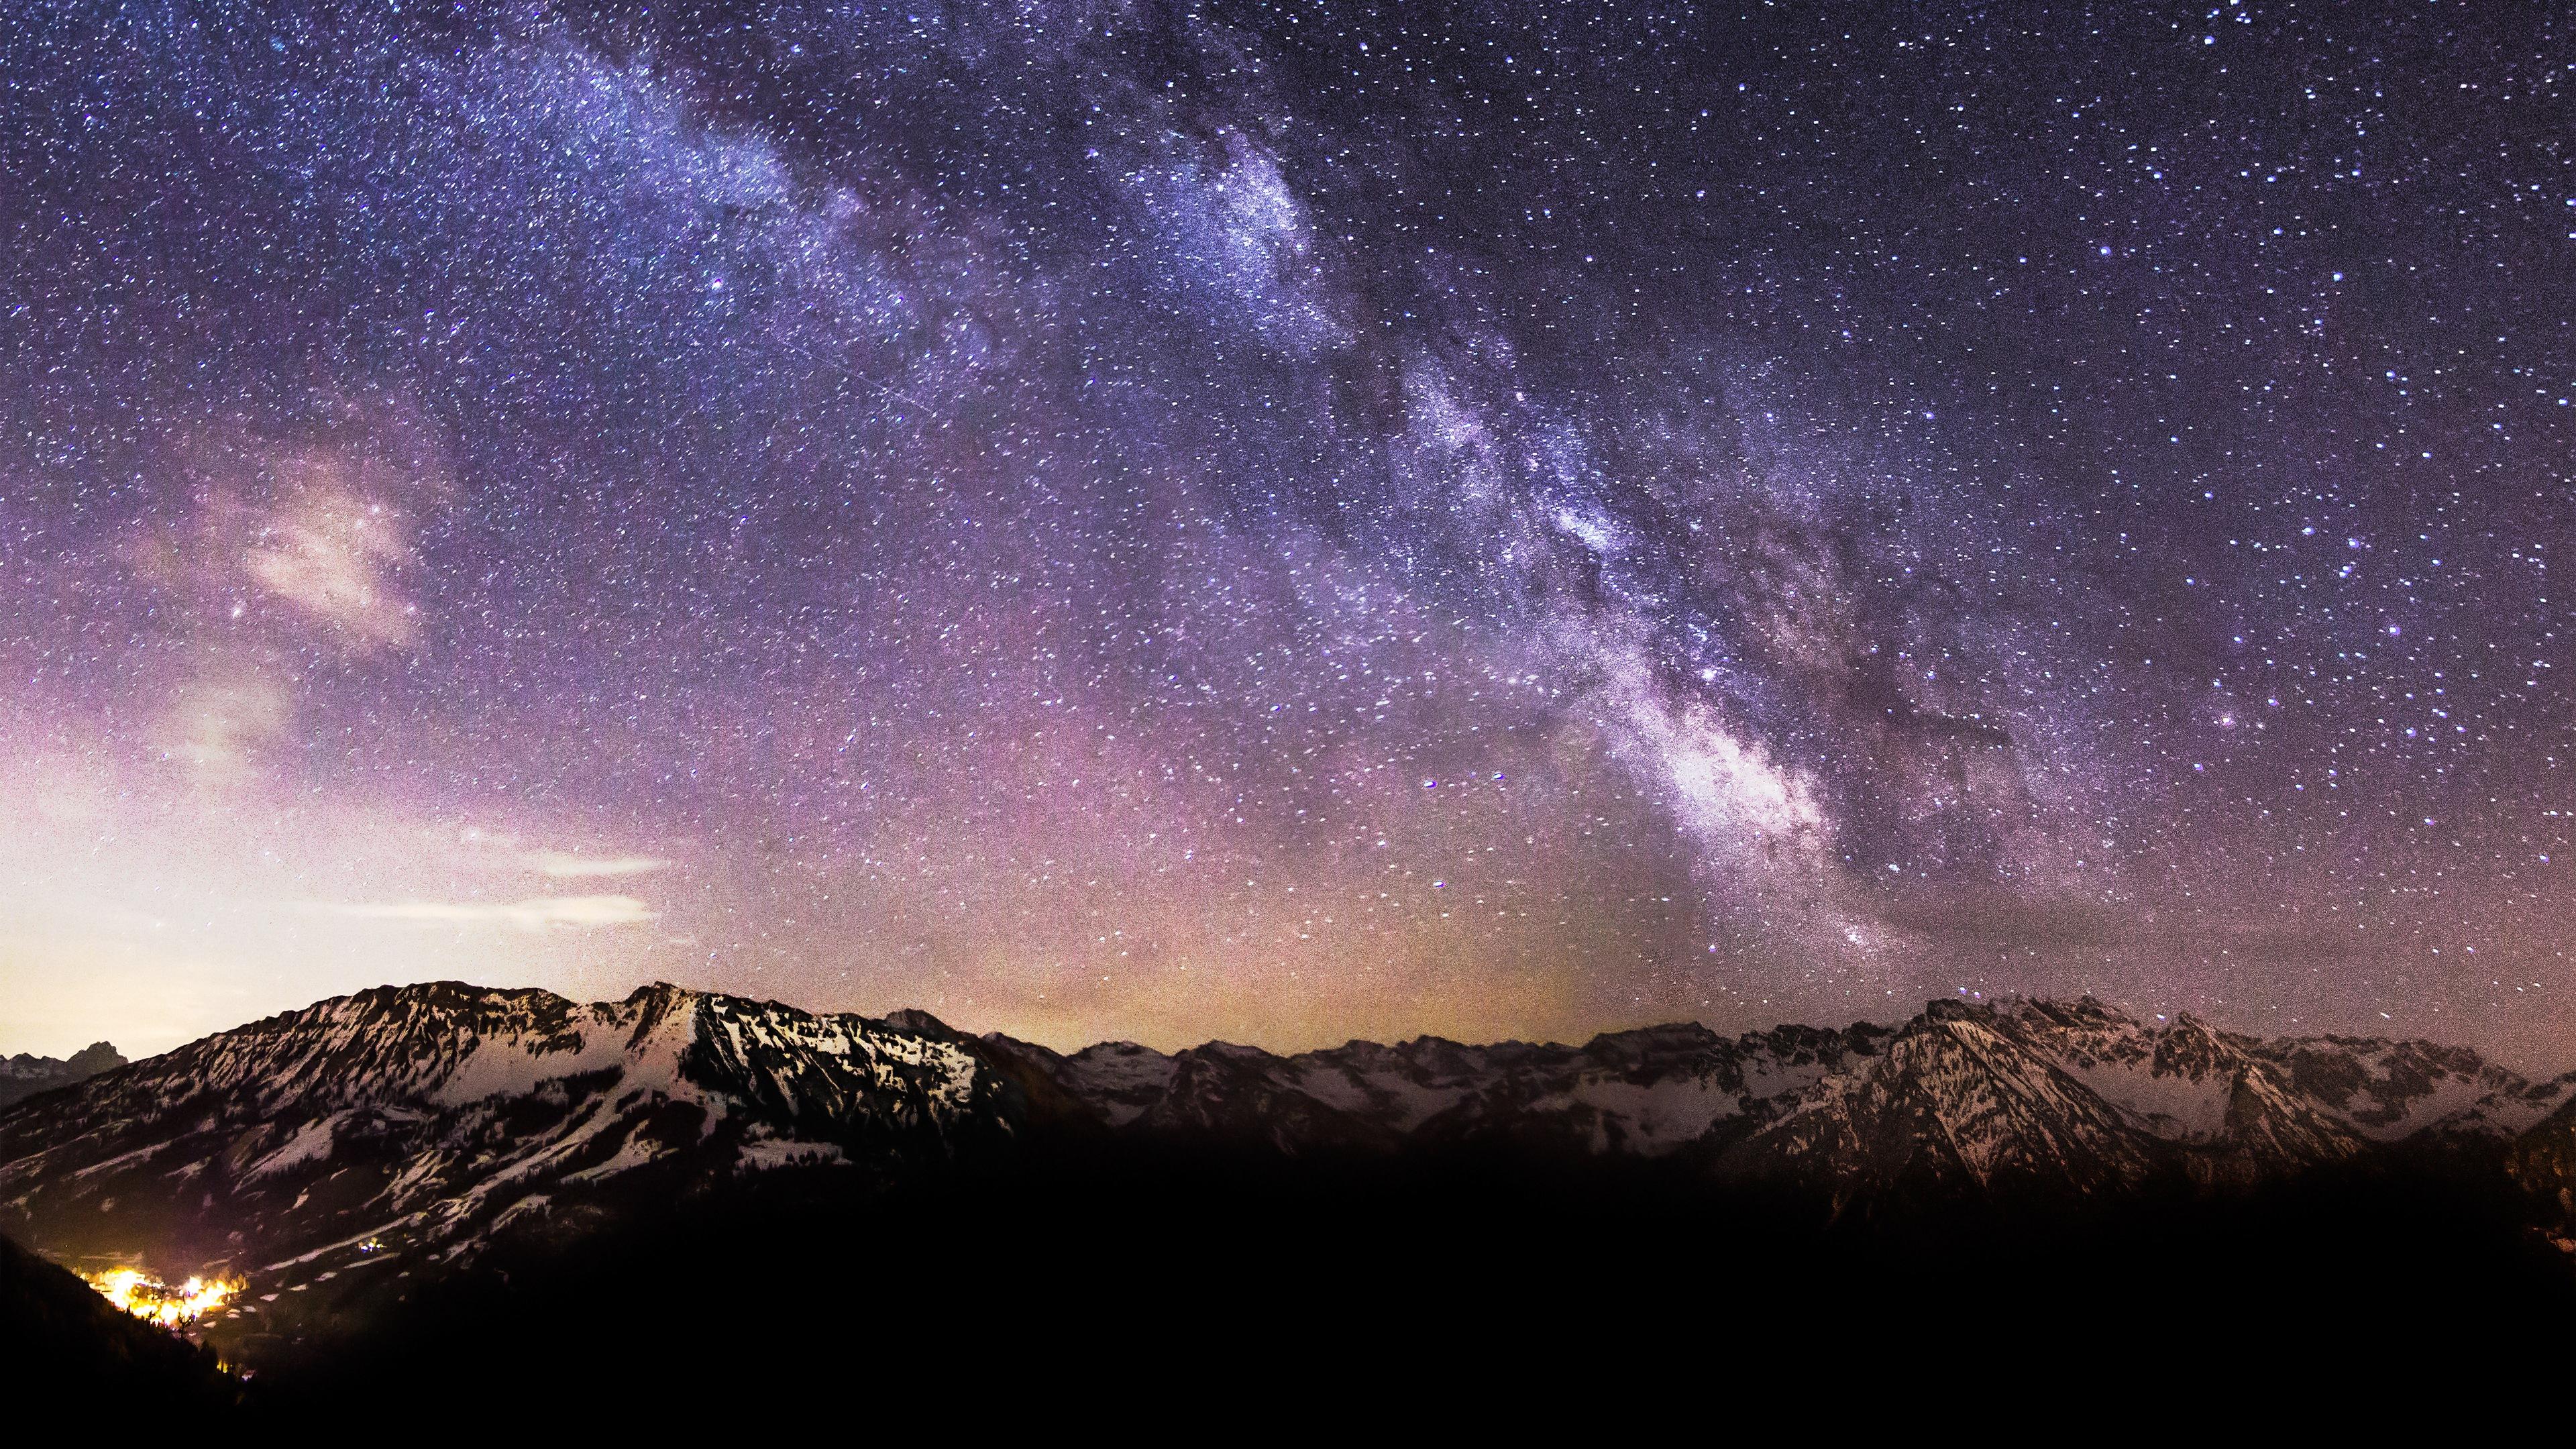 Milky Way Stars Snow Mountains 4K Ultra HD Desktop Wallpaper 3840x2160